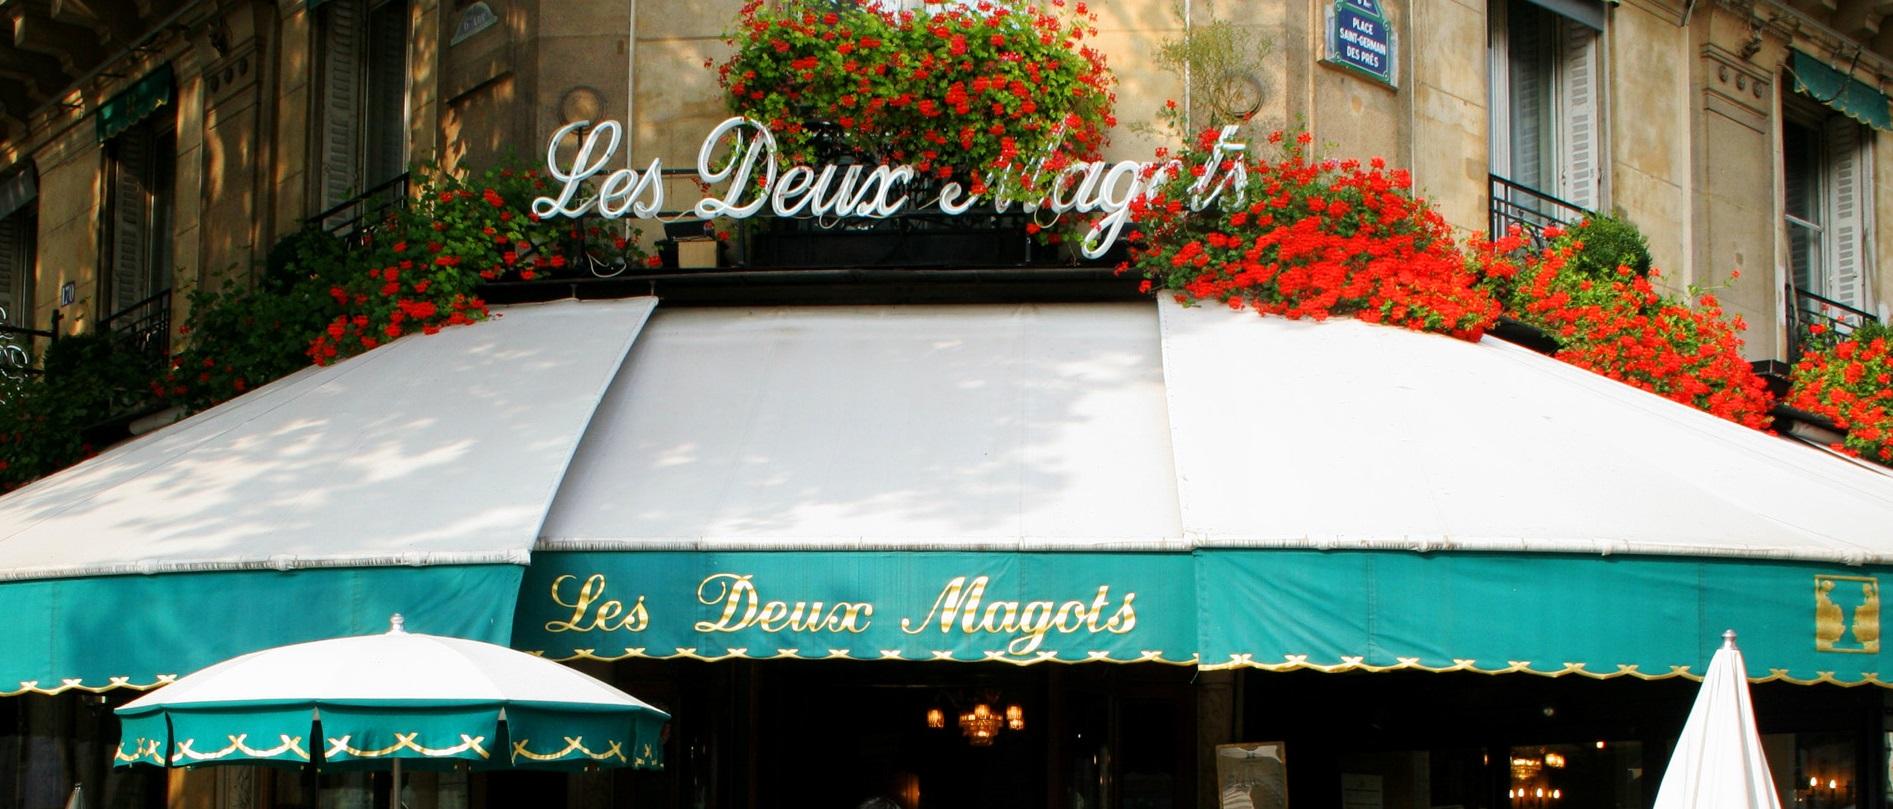 Midnight in Les Deux Magots